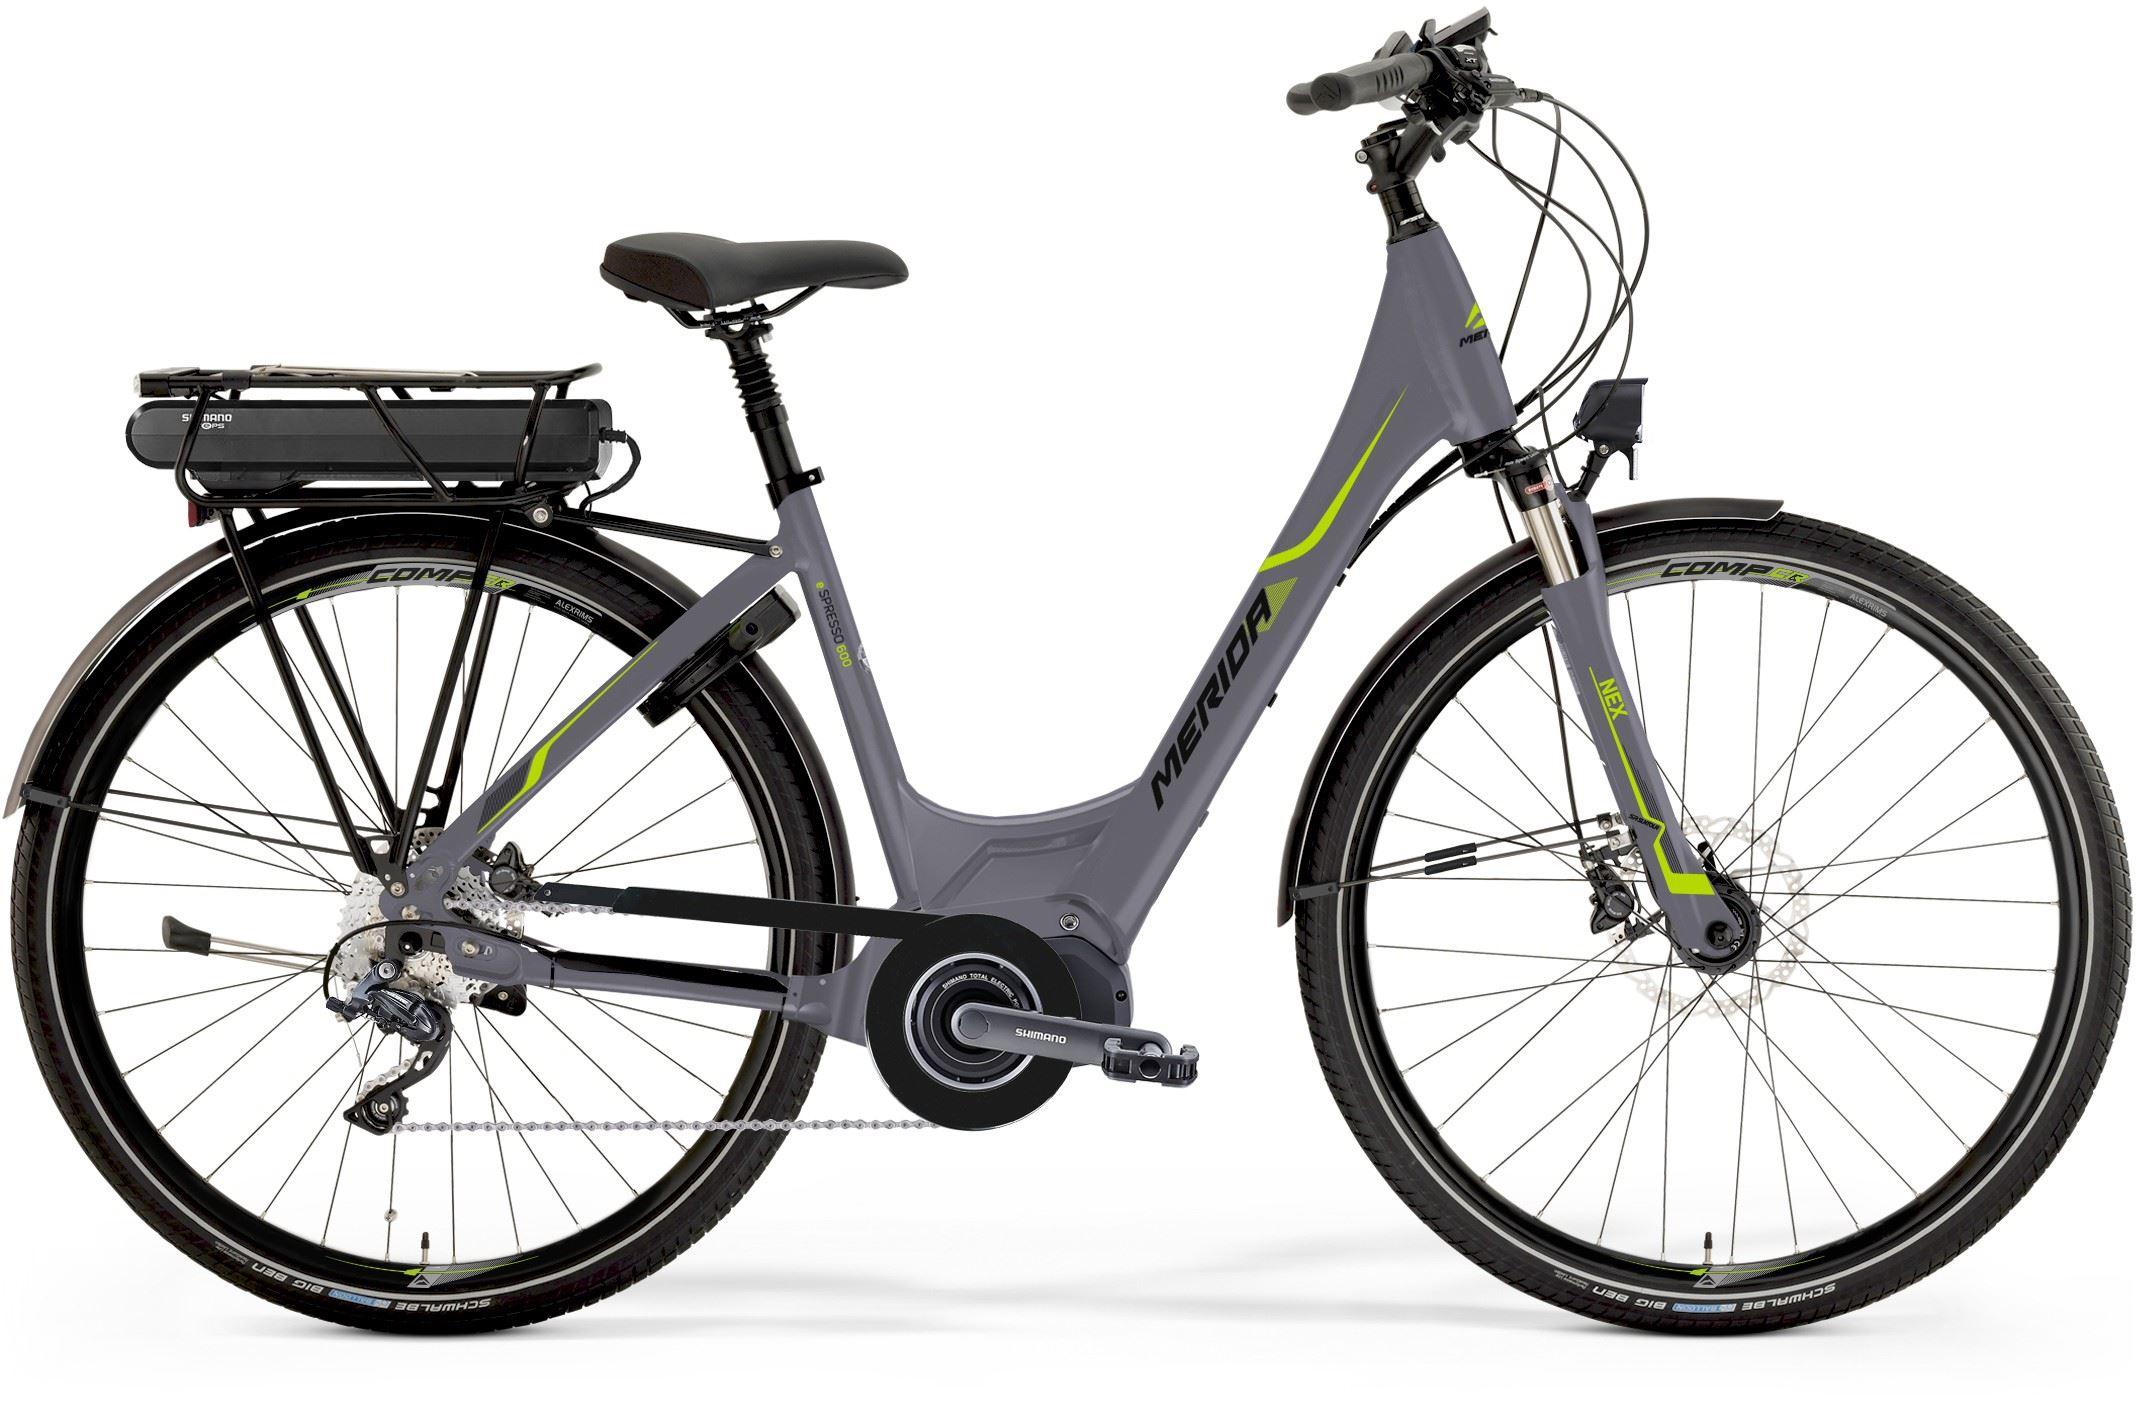 02. Electric Bike Rental